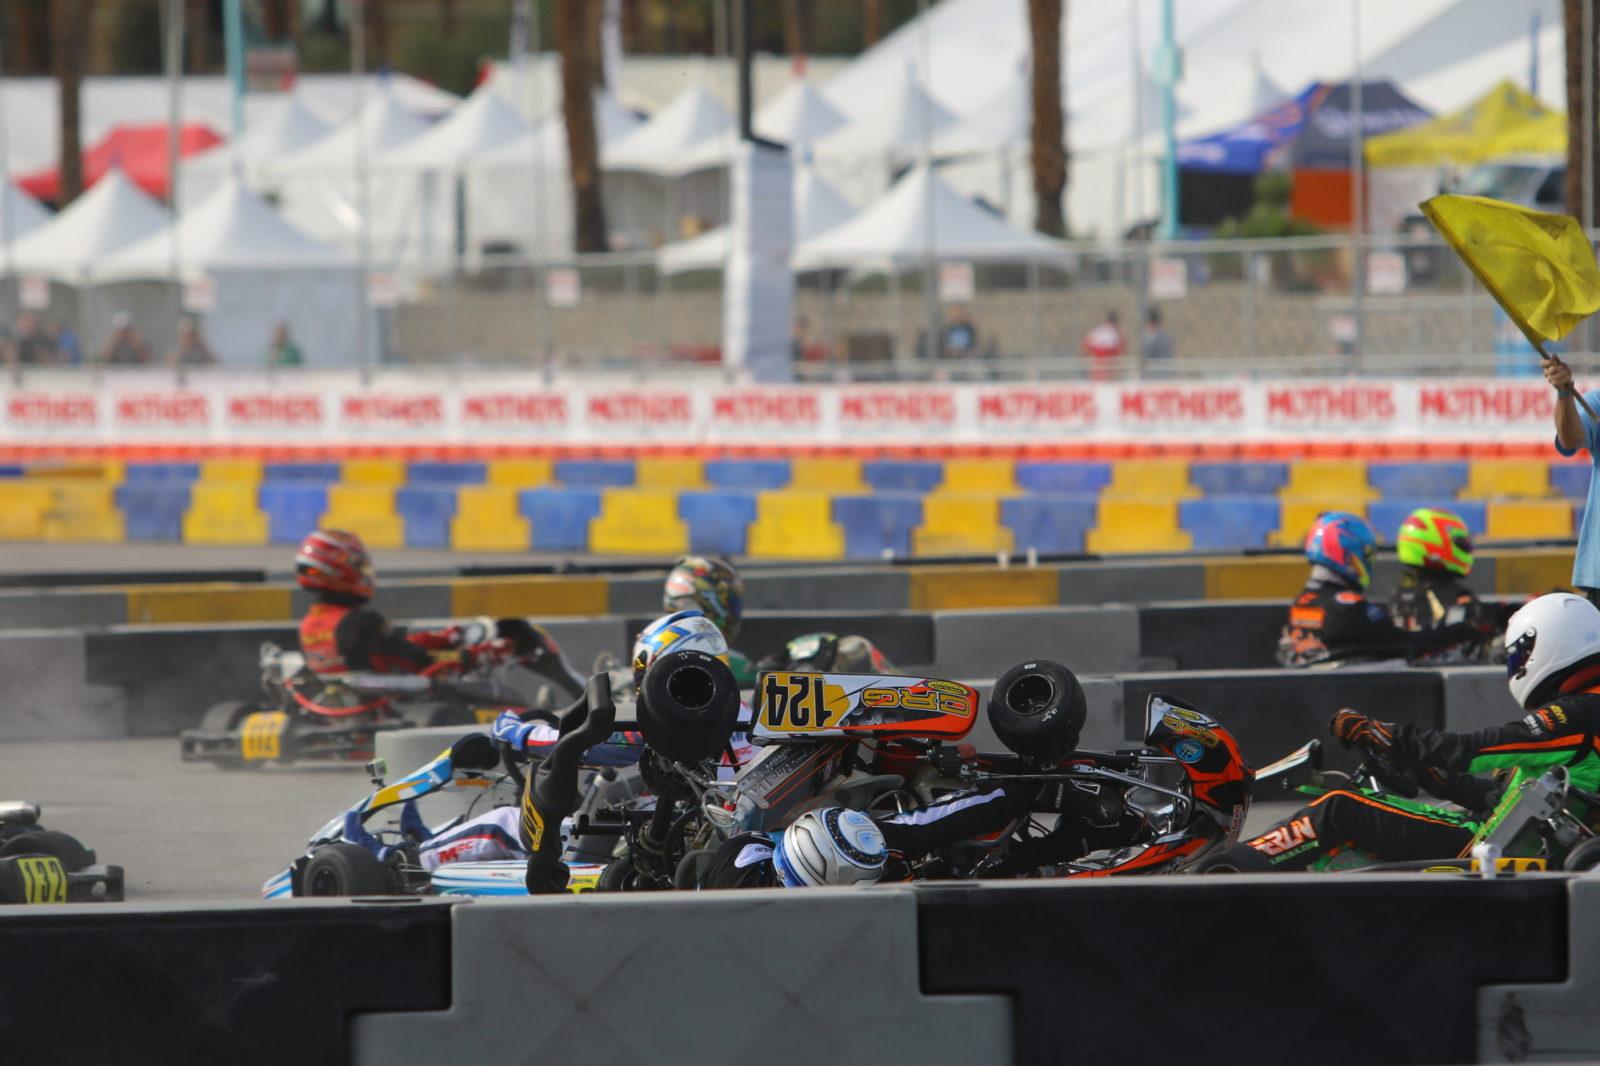 Flipped kart 2018 SKUSA SuperNationals XXII